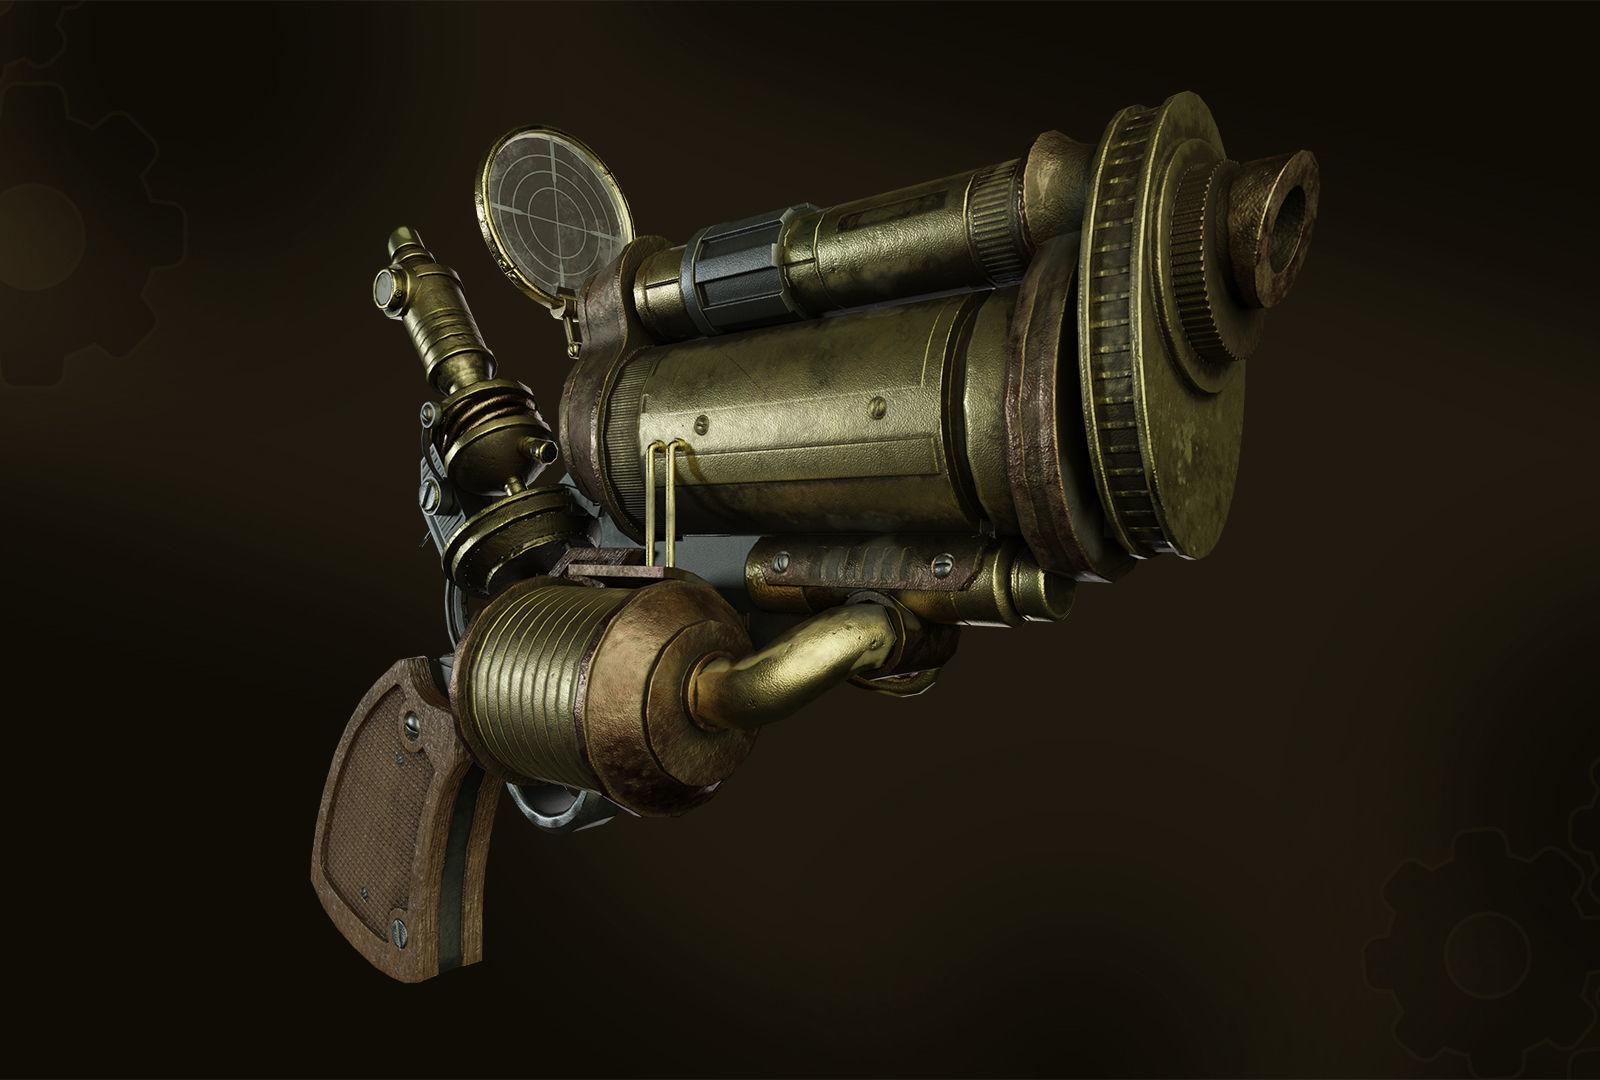 Steampunk gun whith microscope